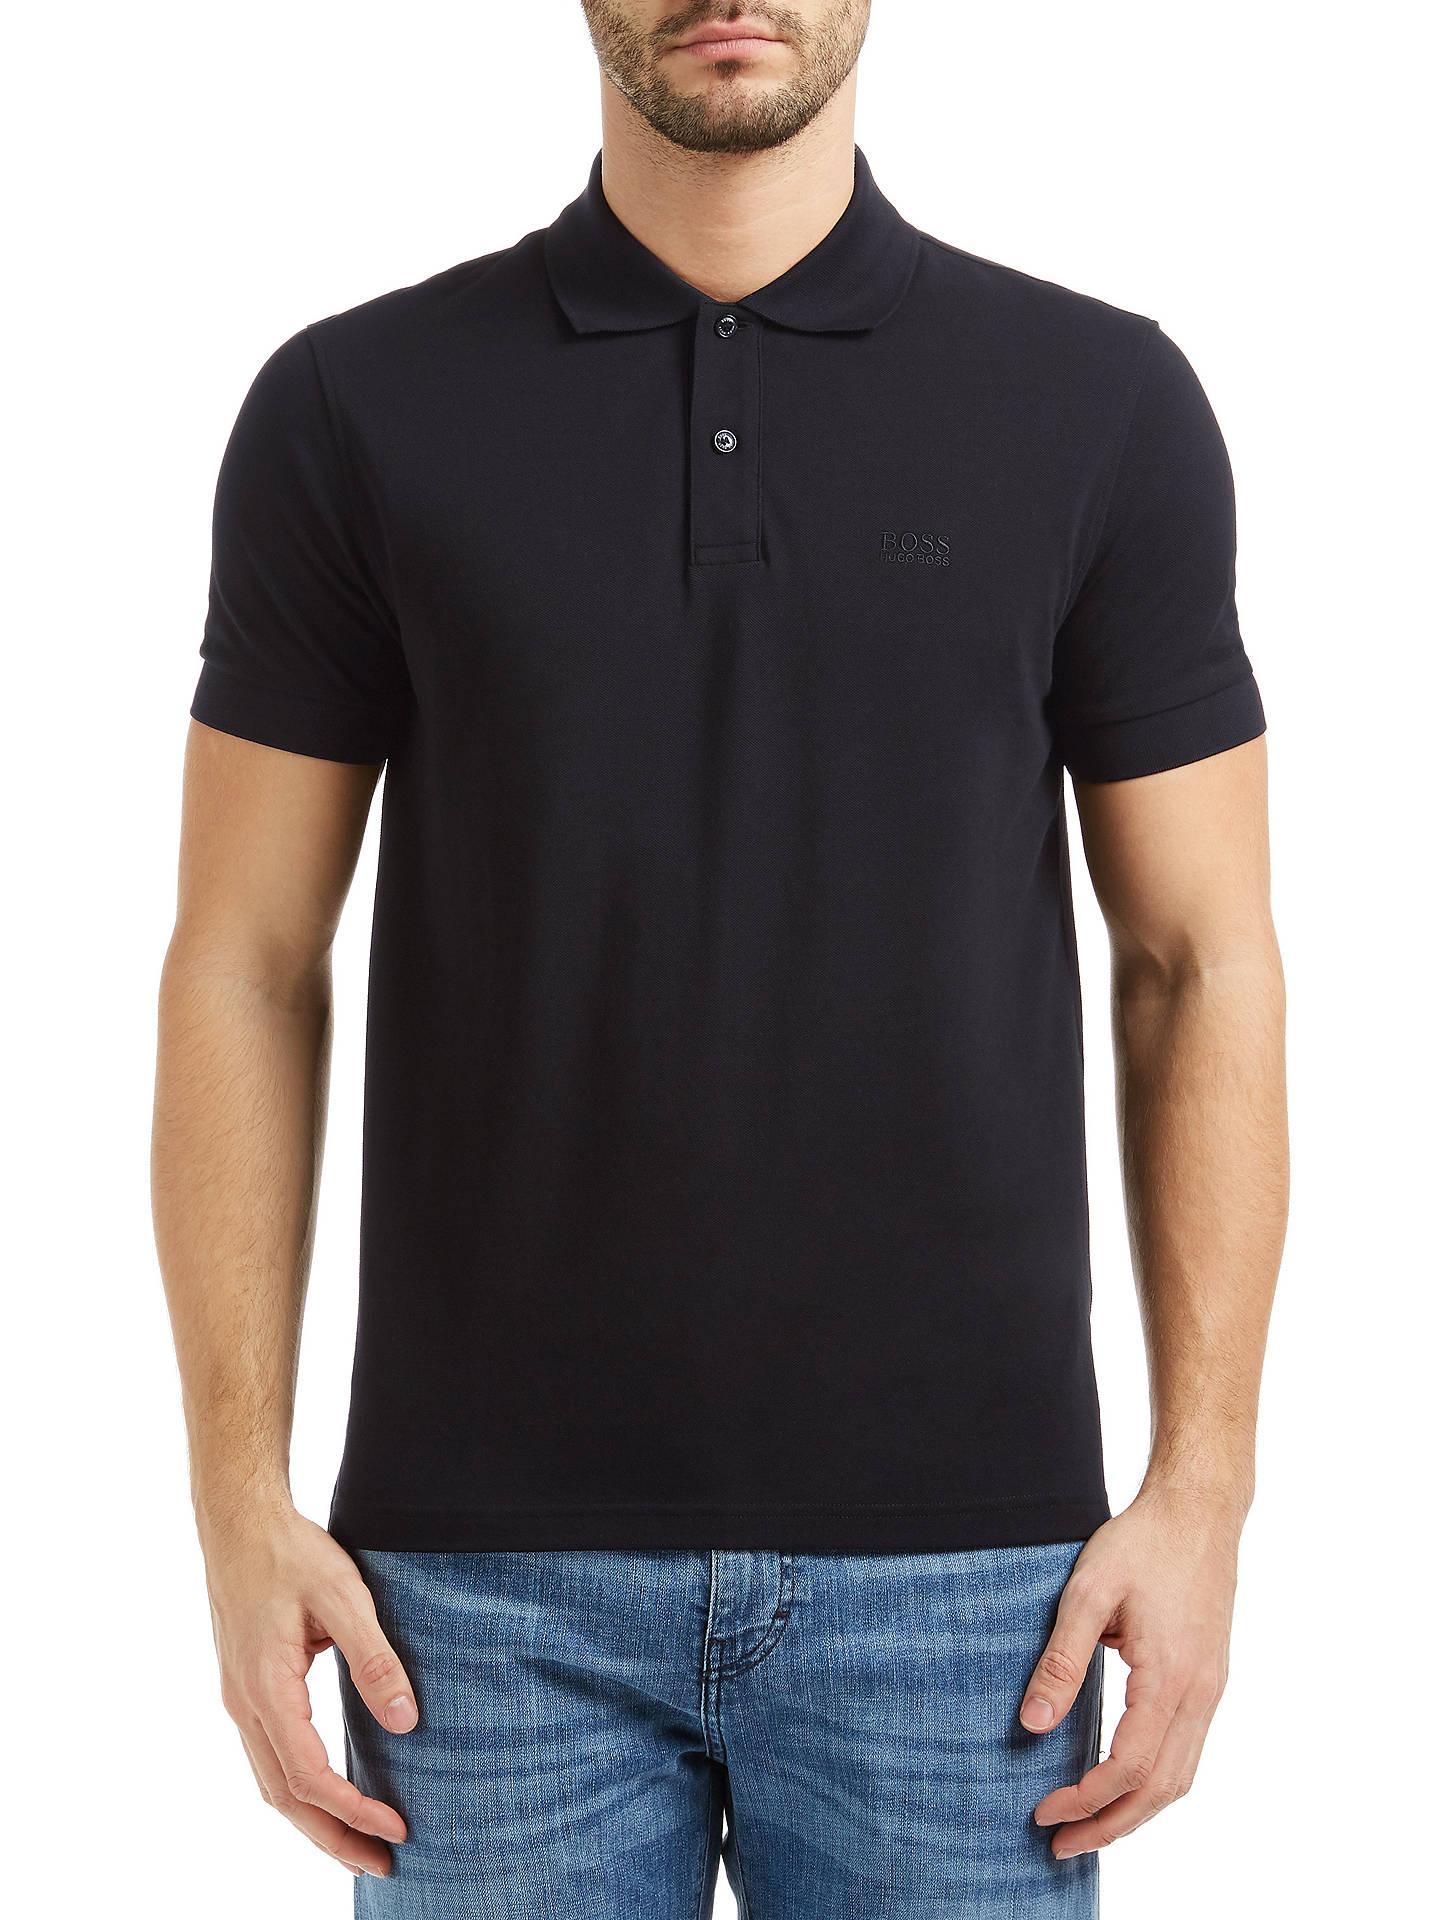 38e97388 Buy BOSS Green C-Firenze Polo Shirt, Black, S Online at johnlewis.